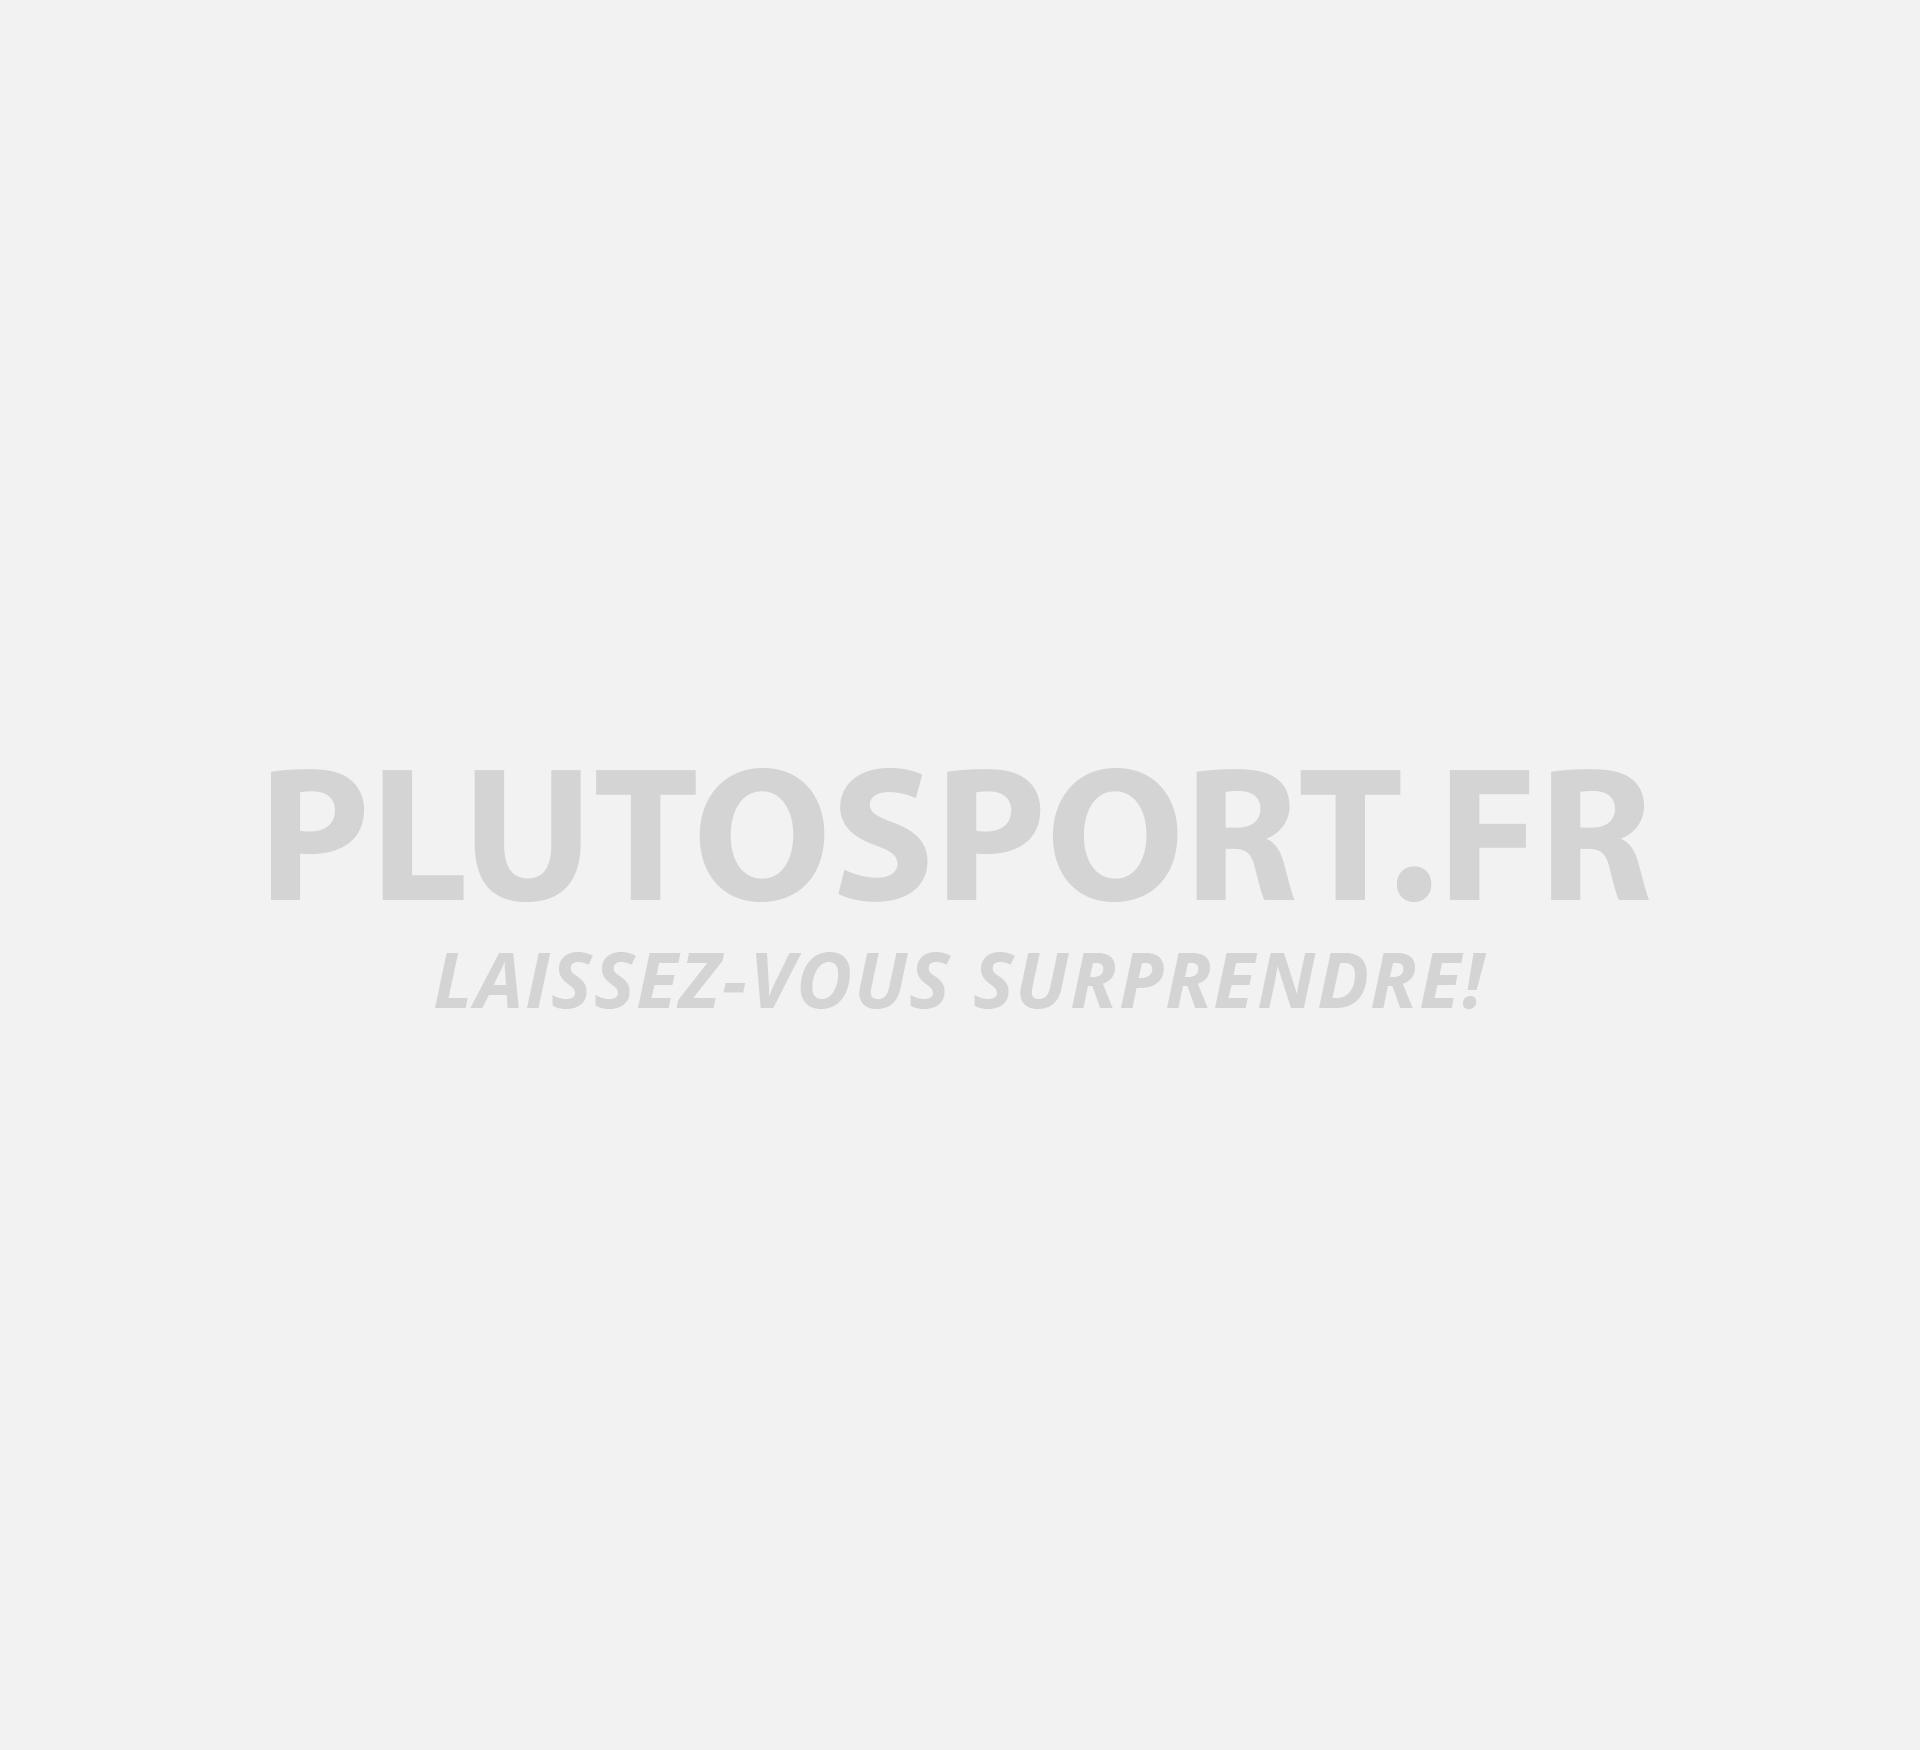 f5f51b1d53 Survêtement Lacoste Sport Colorblock Taffeta - Survêtements ...